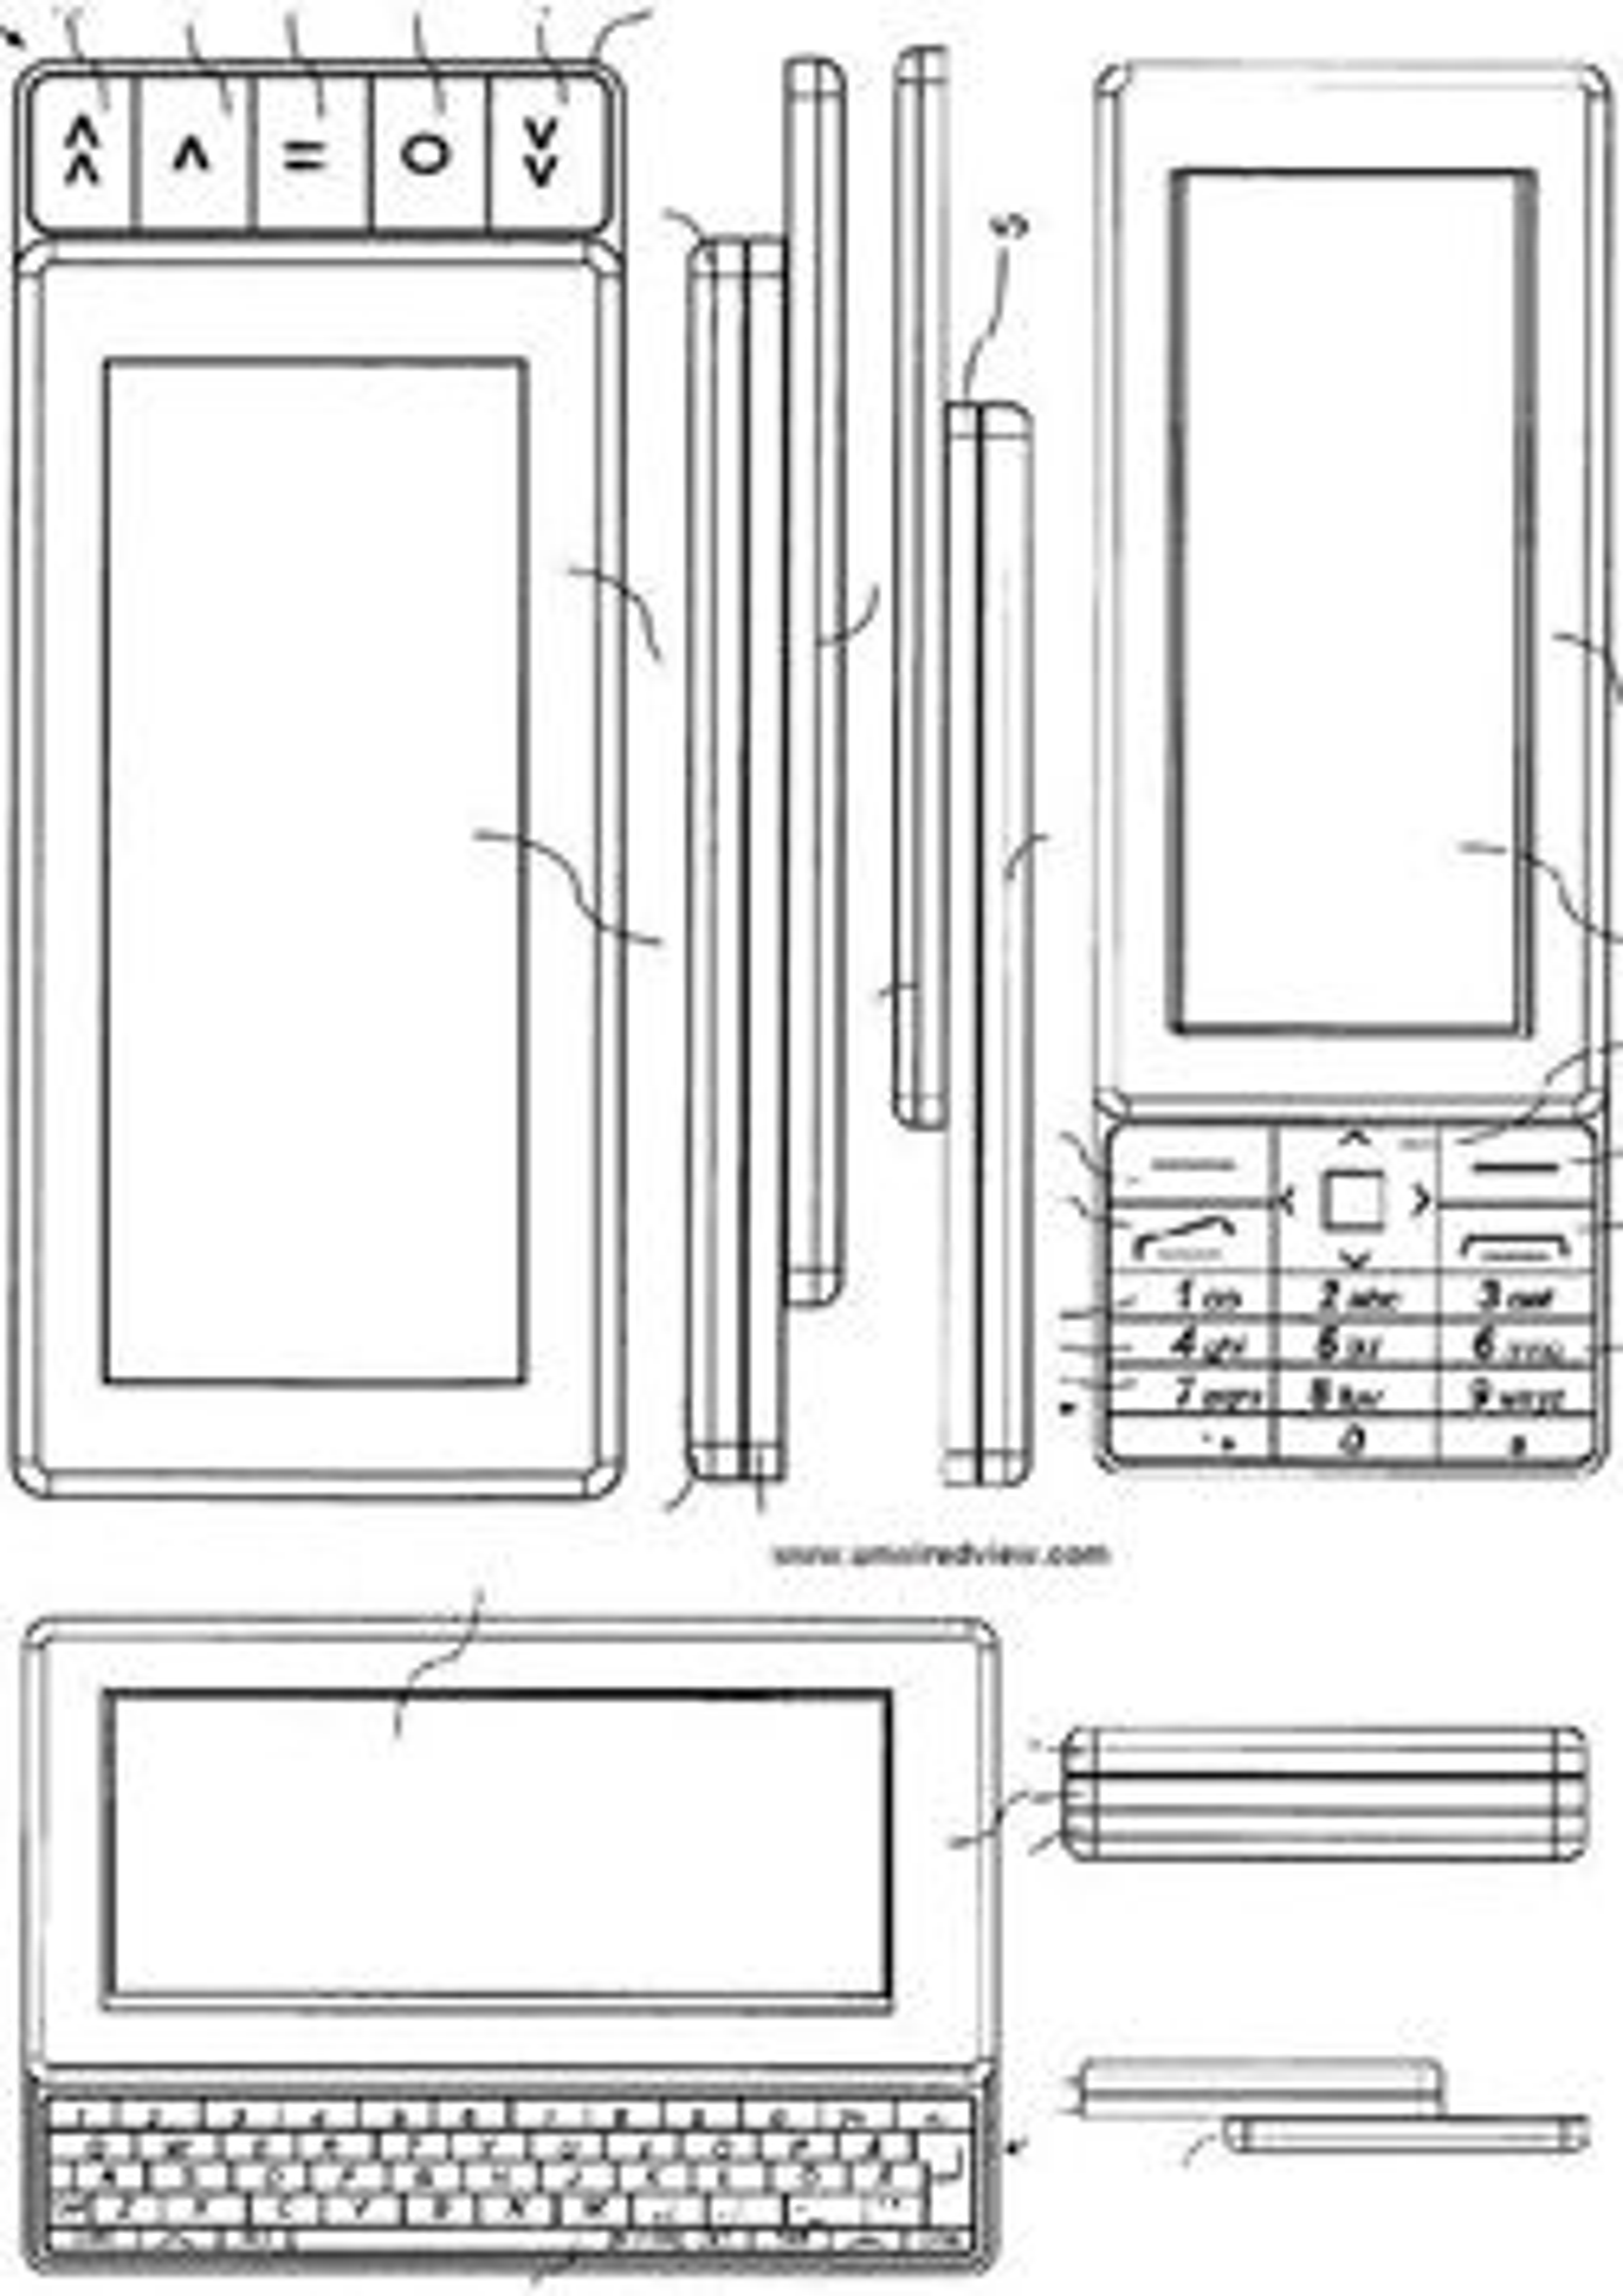 Nokias patenttegning. (Bilde: US Patent & Trademark Office)